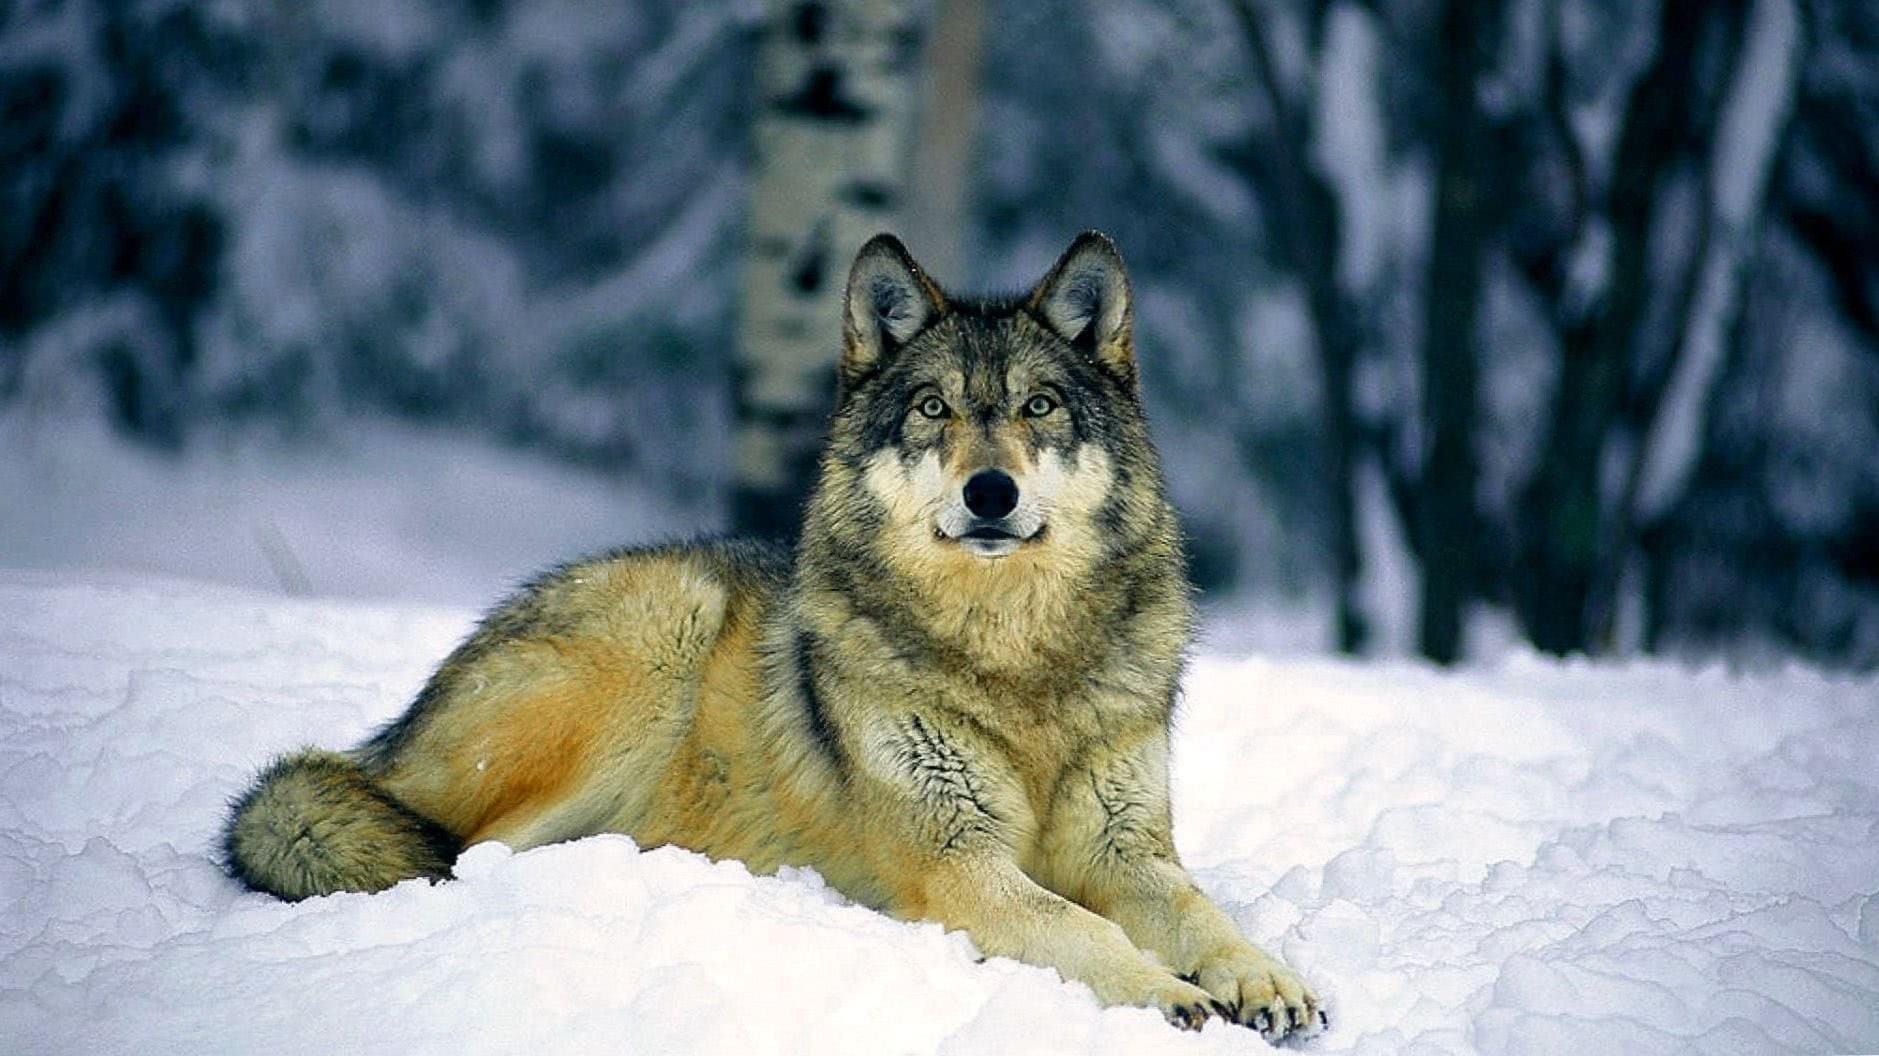 Wallpapers HD Widescreen Wolf